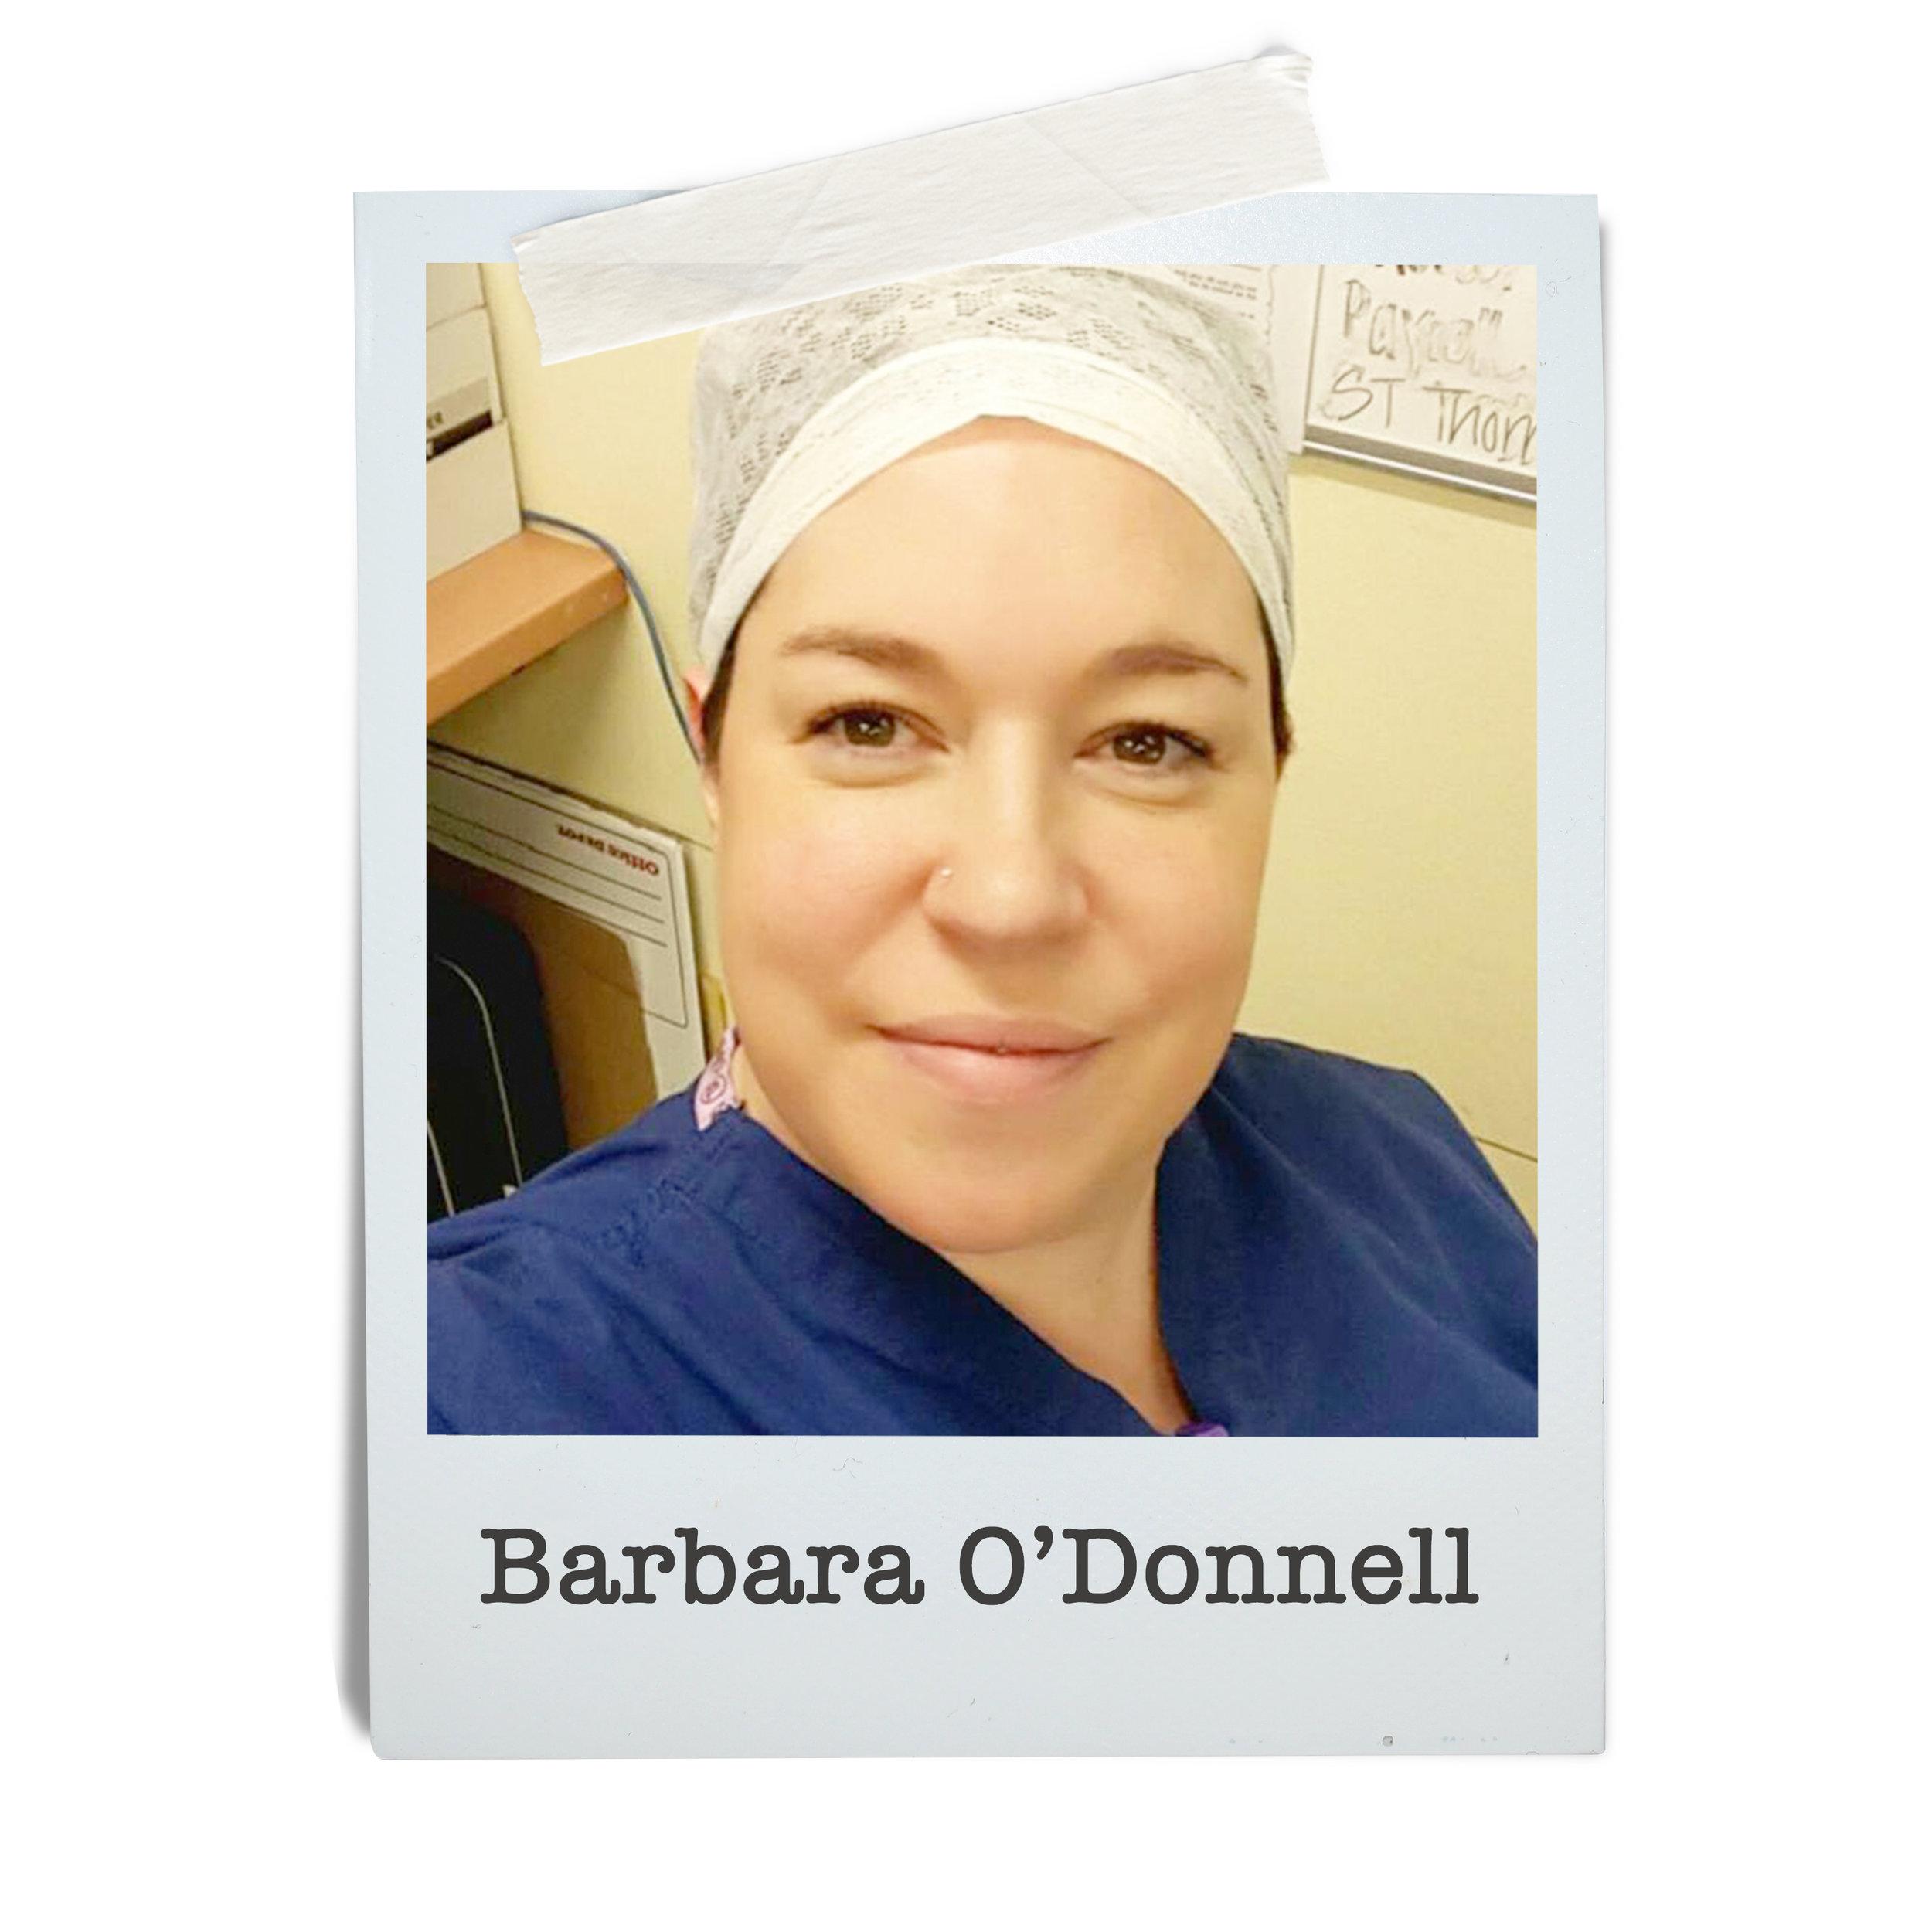 Barbara O'Donnell